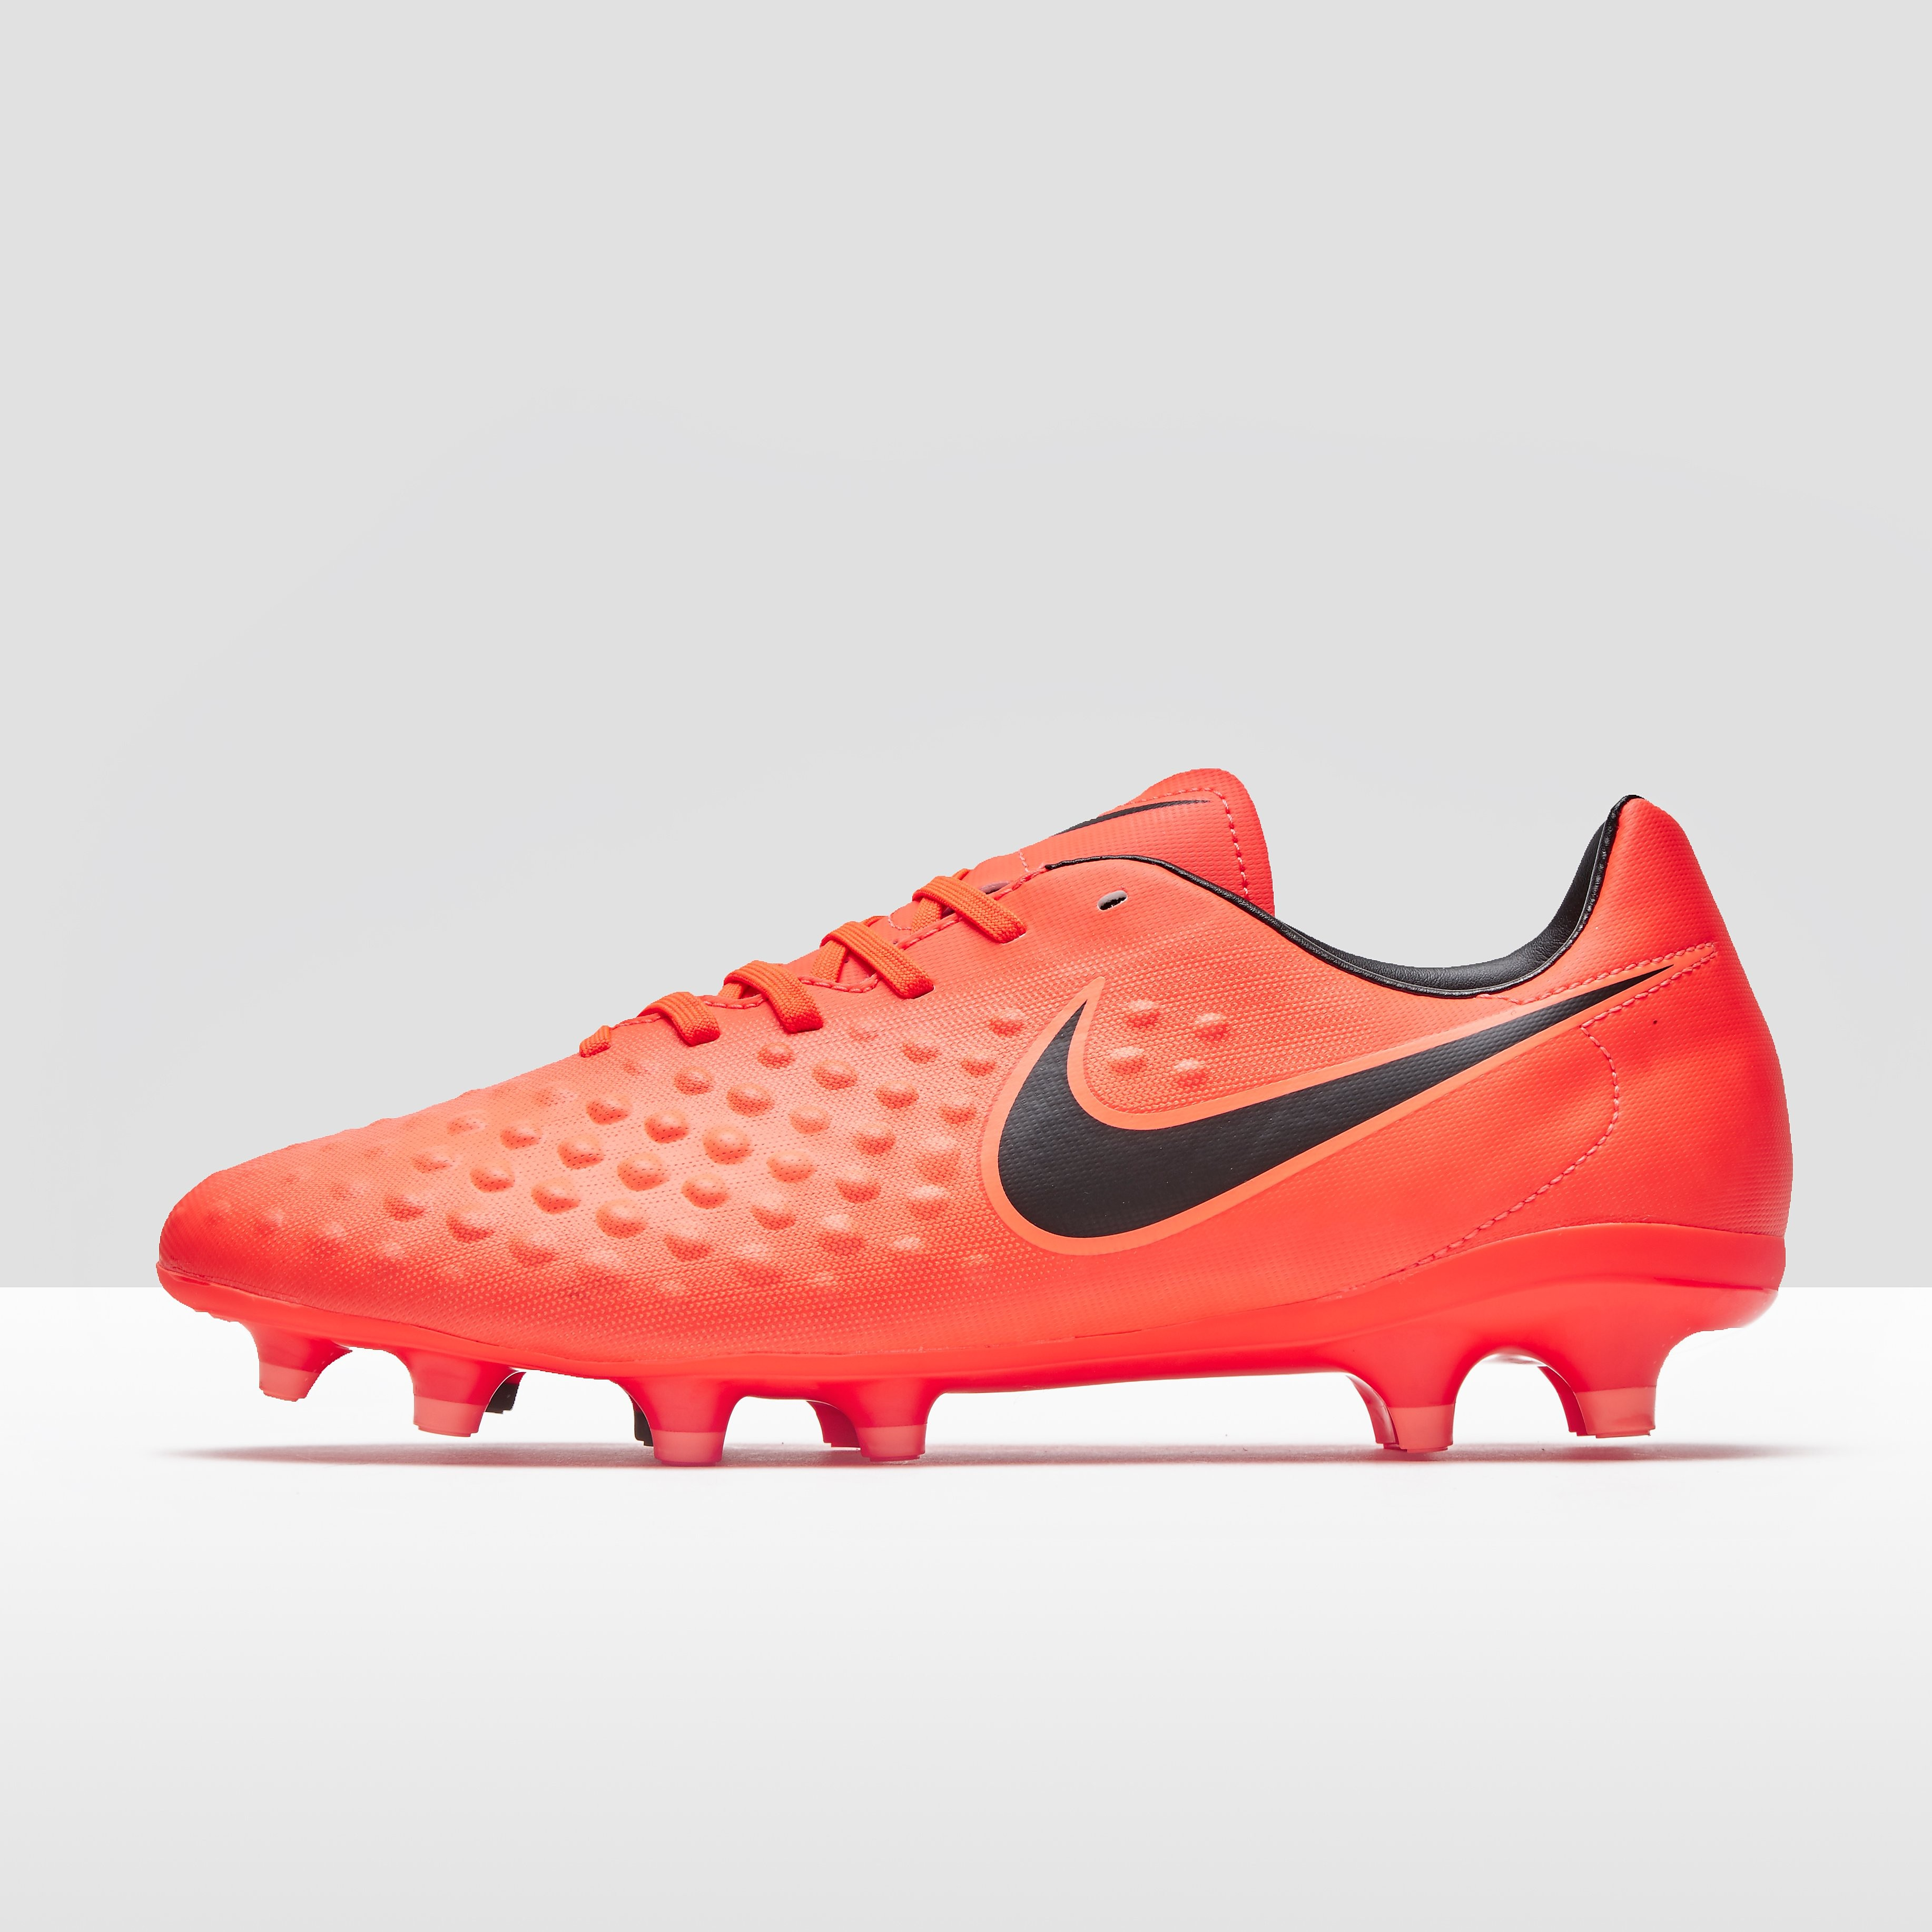 Nike Radiant Flare Magista Onda Men's FG Football Boots